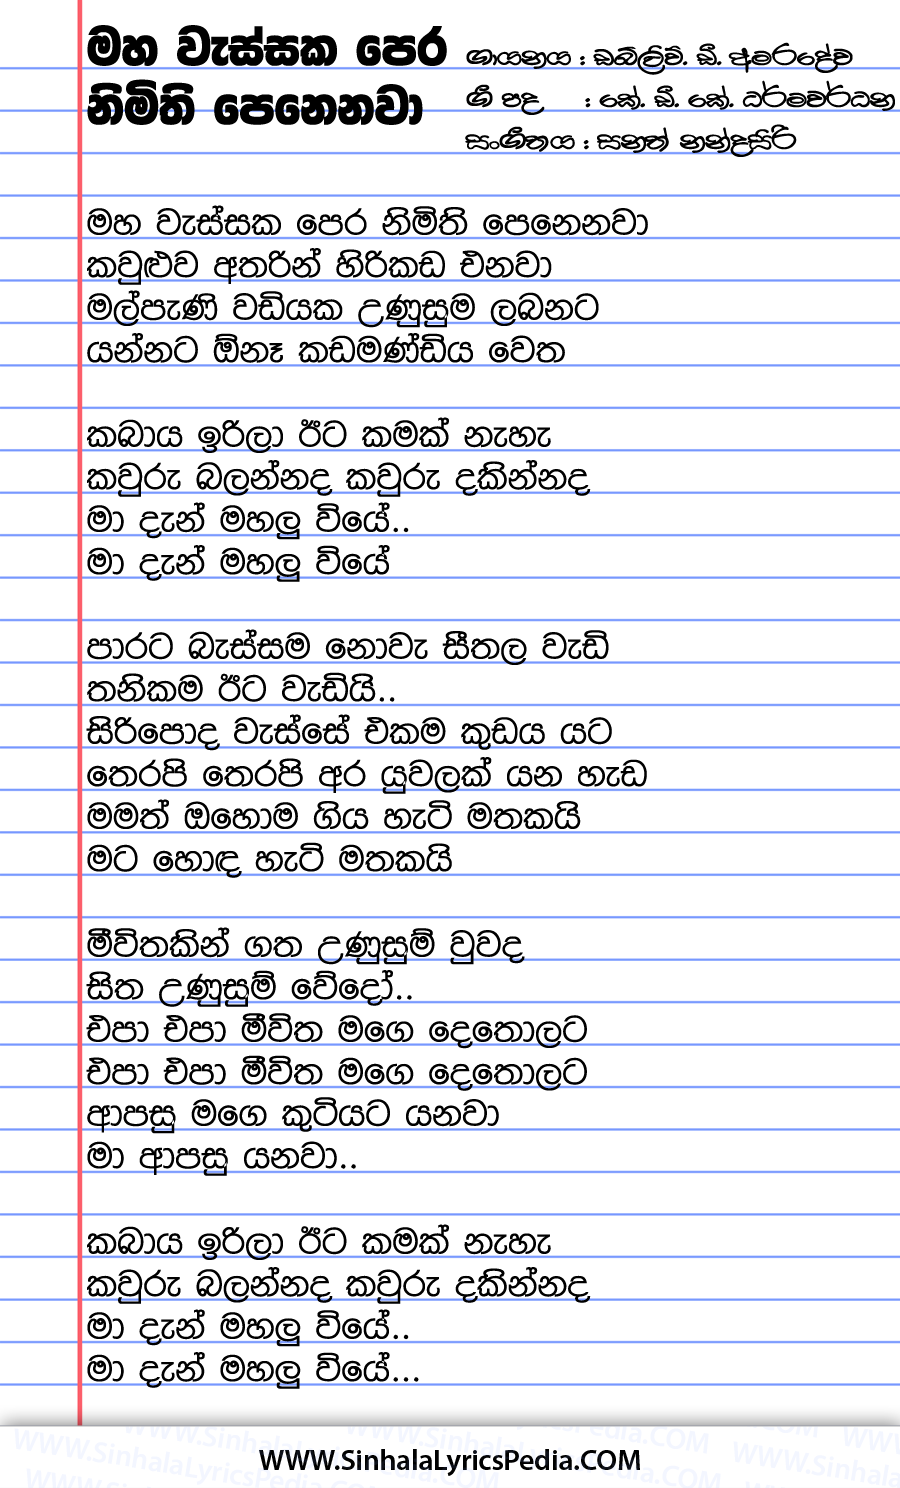 Maha Wassaka Pera Nimithi Penenawa Song Lyrics